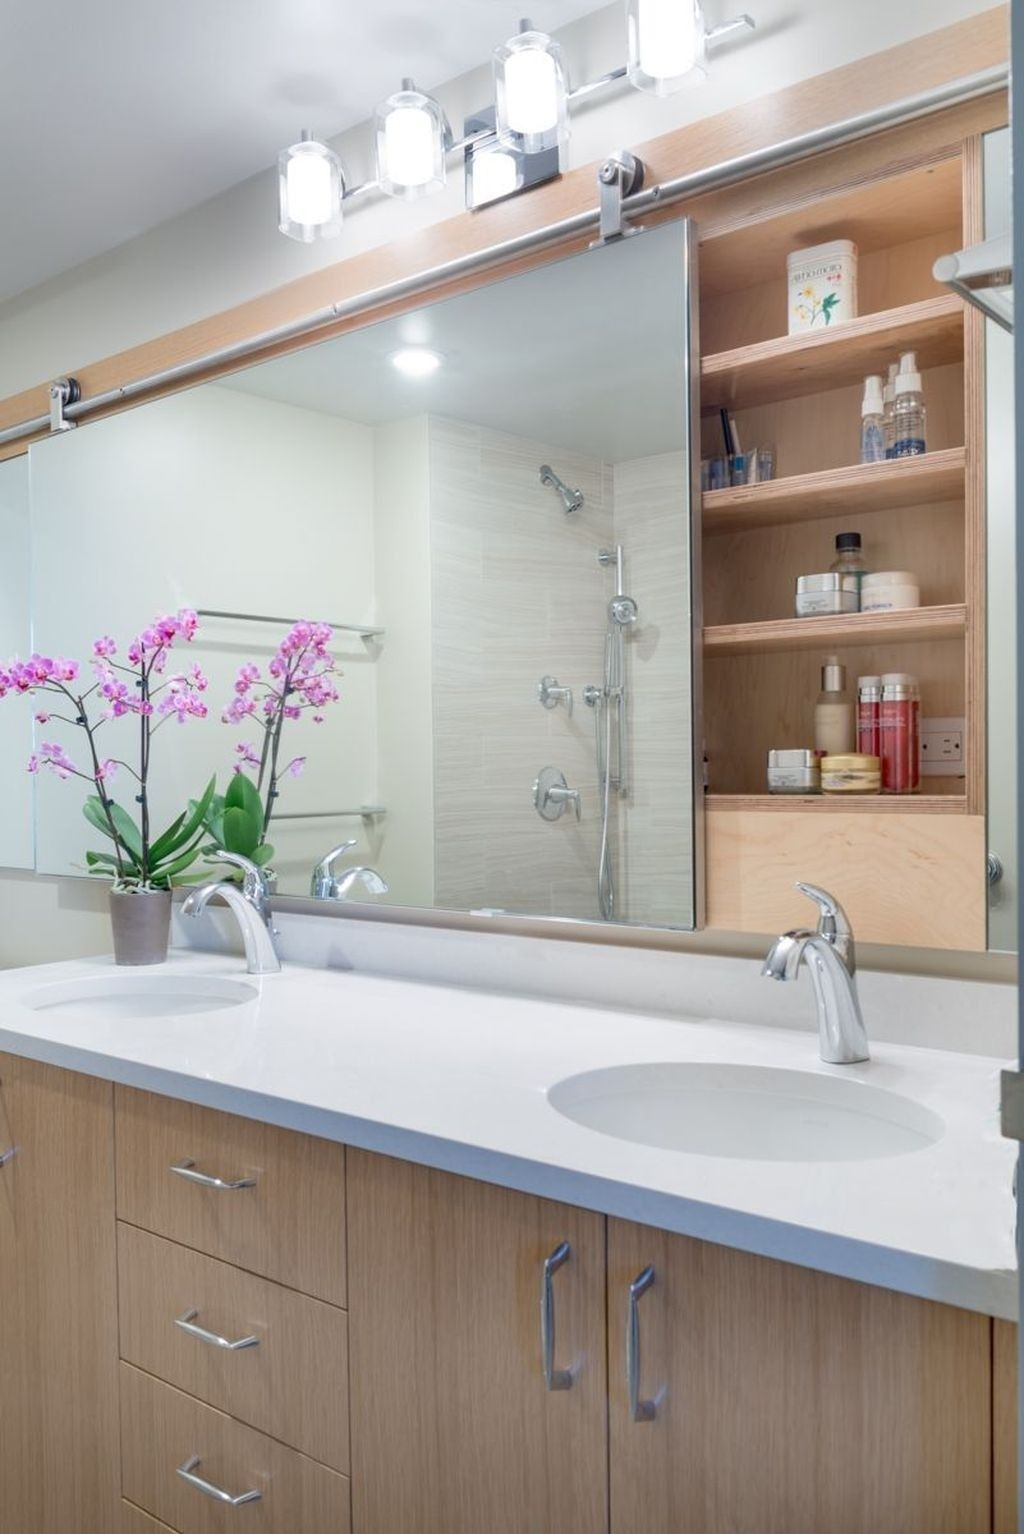 40 Nice Bathroom Mirror Design Ideas For Any Bathroom Model